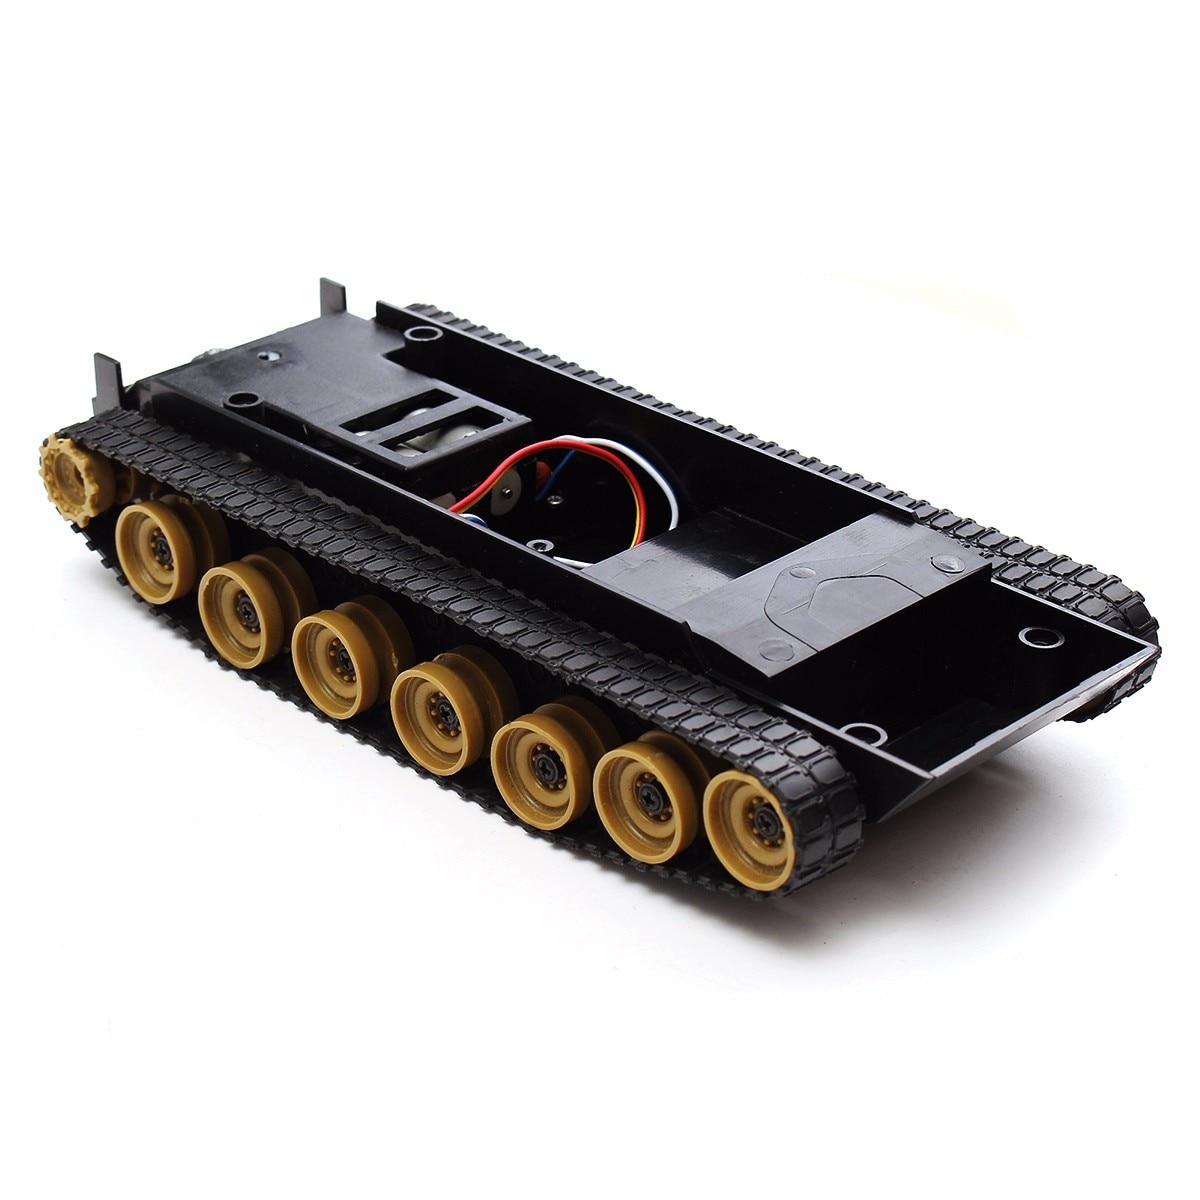 NEW 3V~7.4V Rc Tank Smart Robot Tank Car Chassis Kit Rubber Track Crawler Kit for Arduino SCM